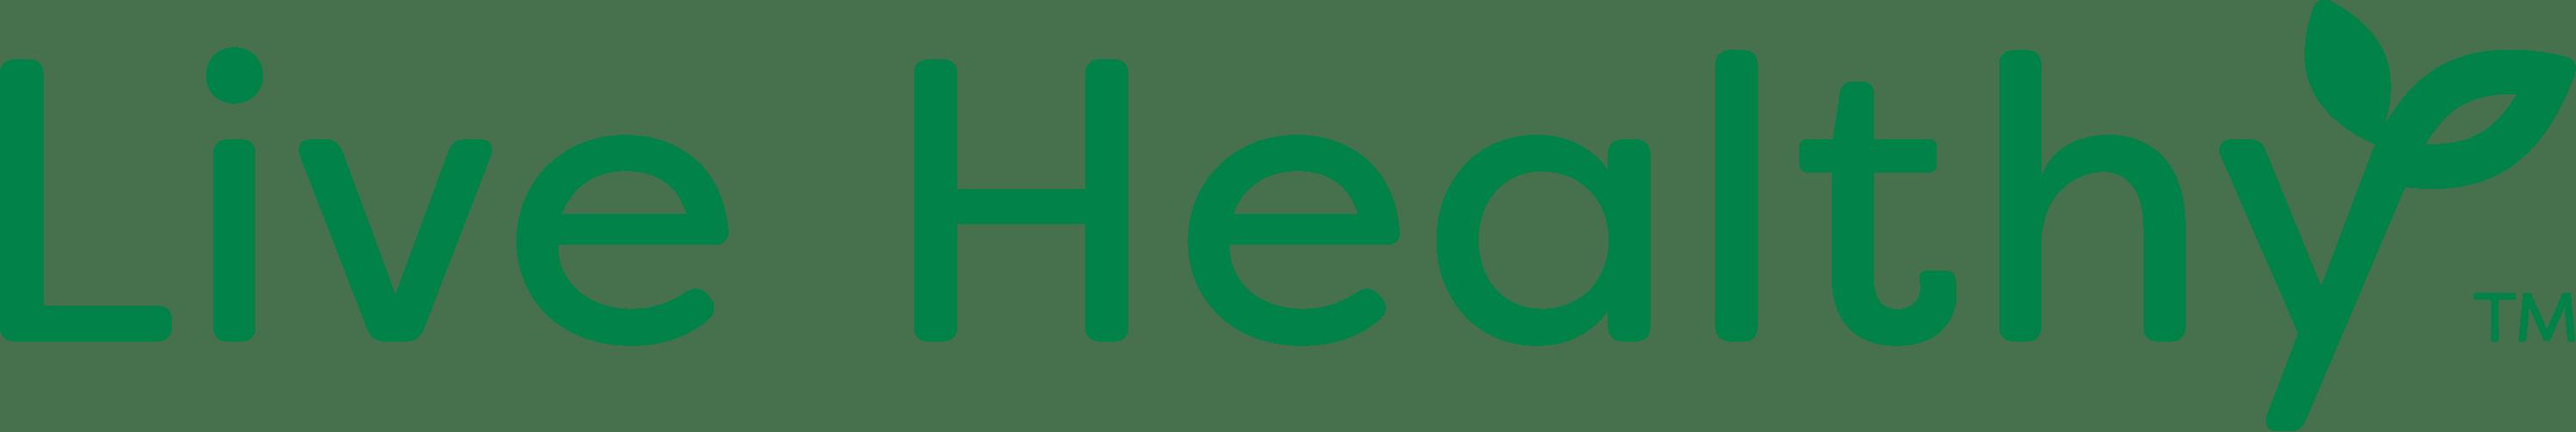 Live Healthy logo